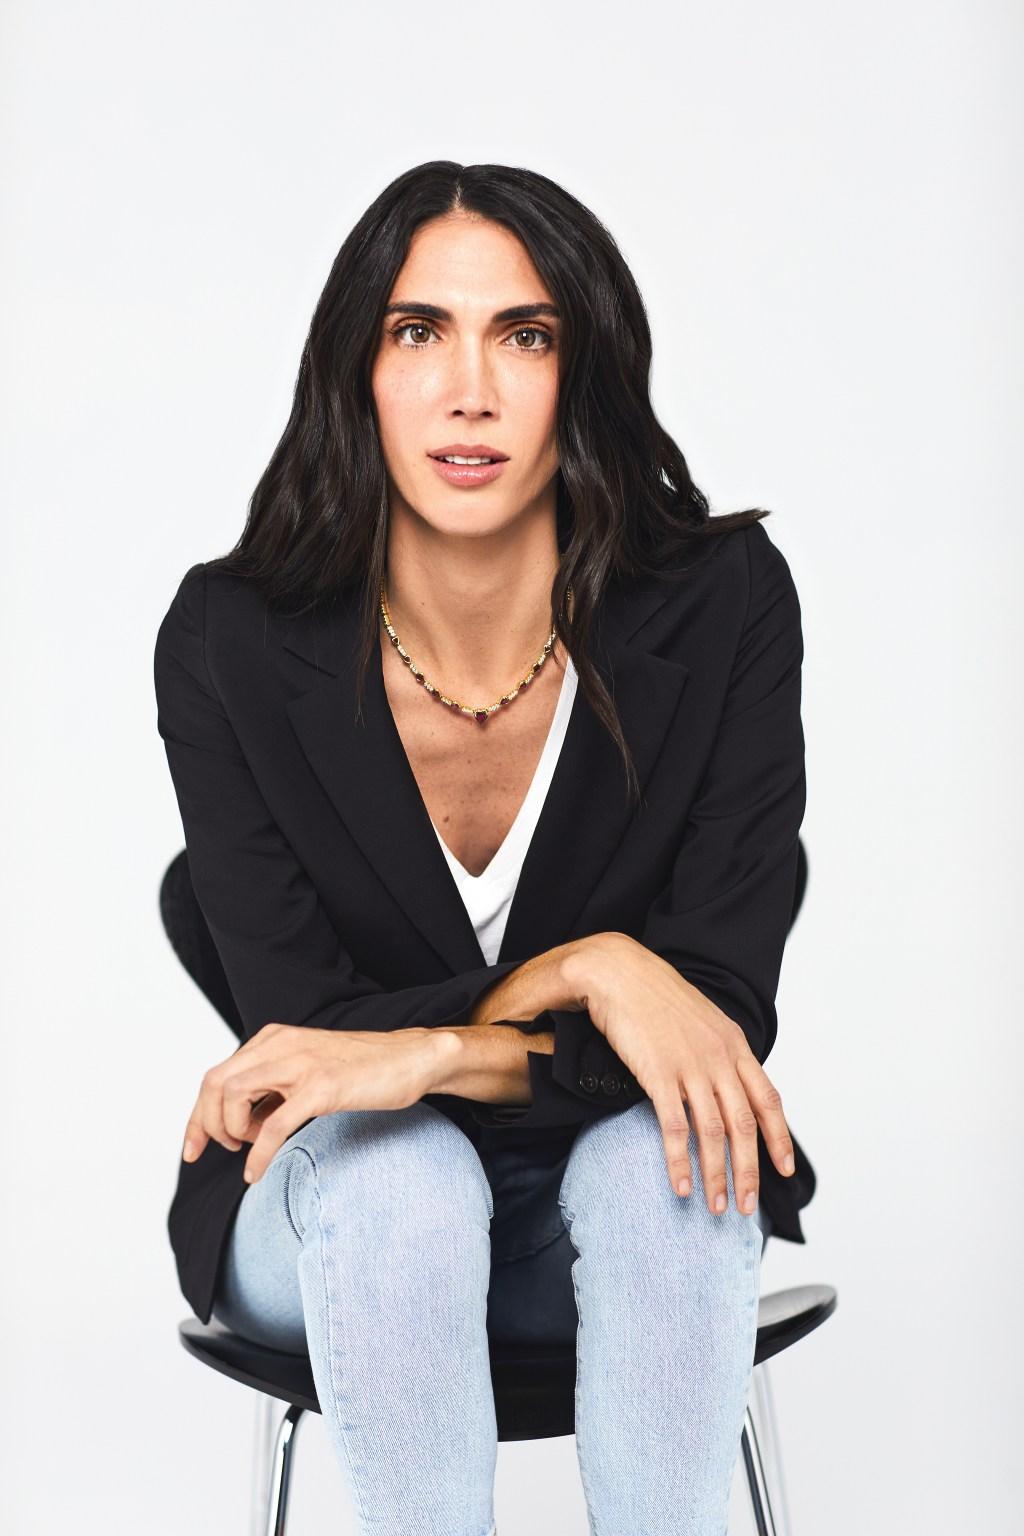 Michaeline DeJoria